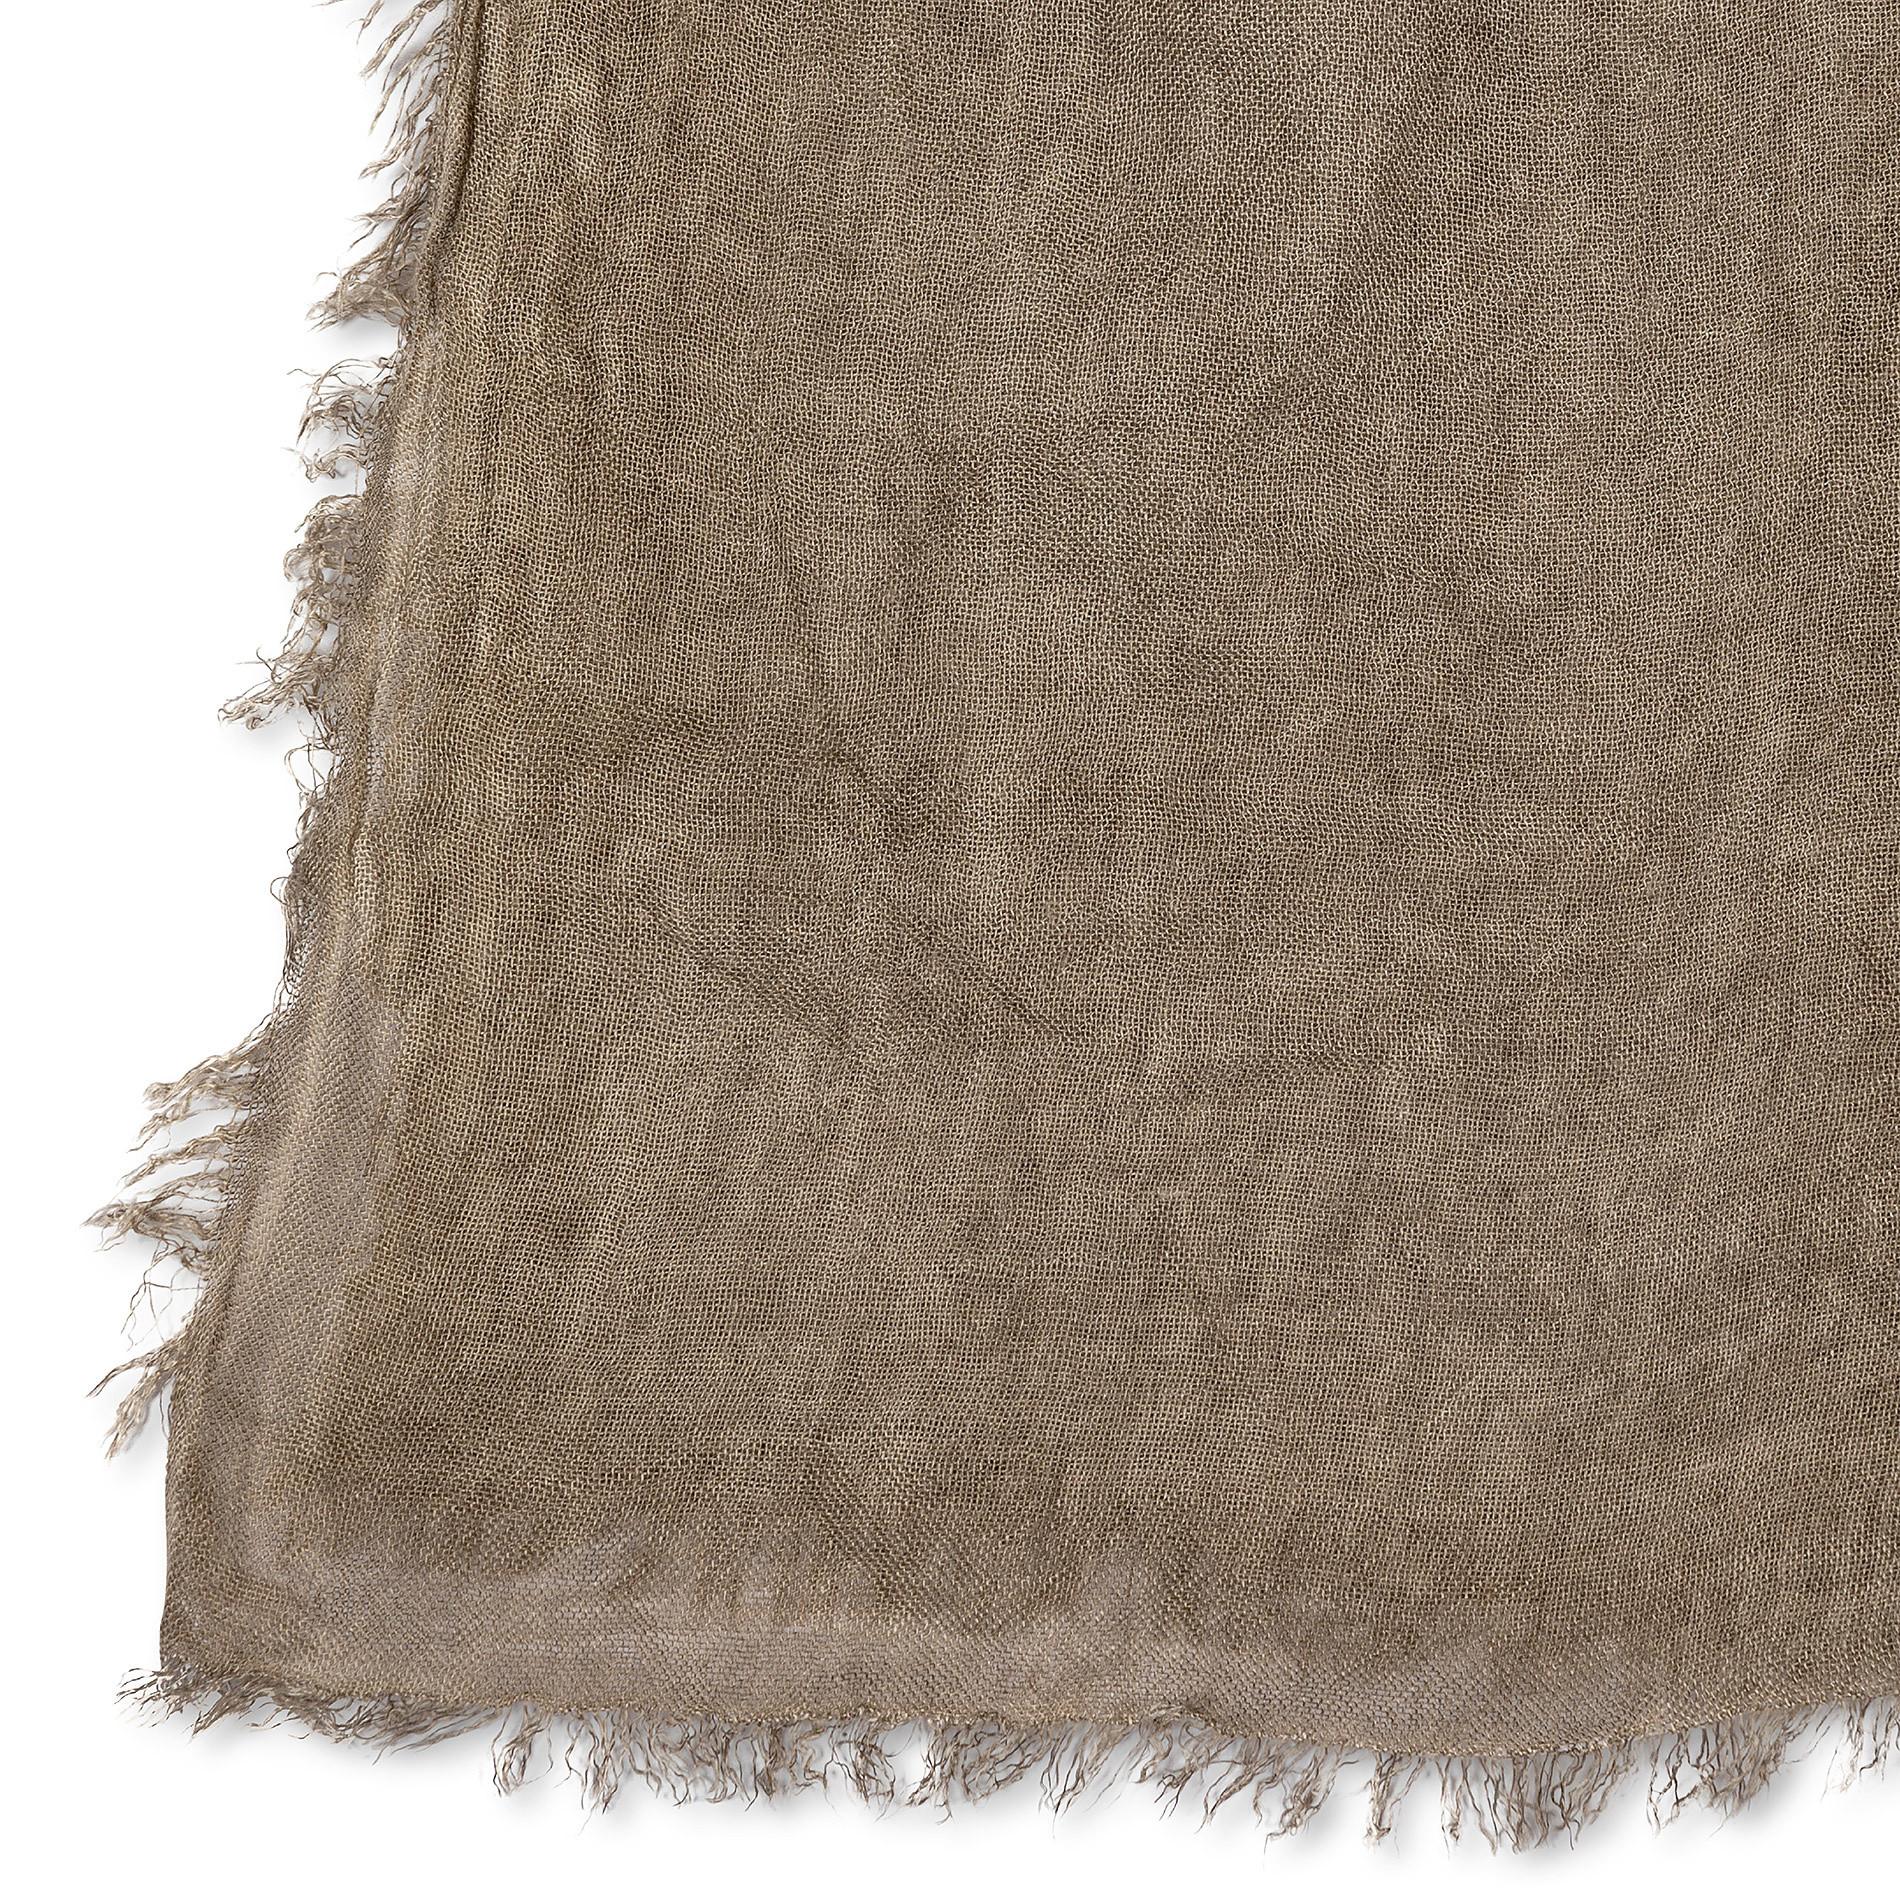 Stola in viscosa di bamboo tinta unita, Marrone, large image number 1